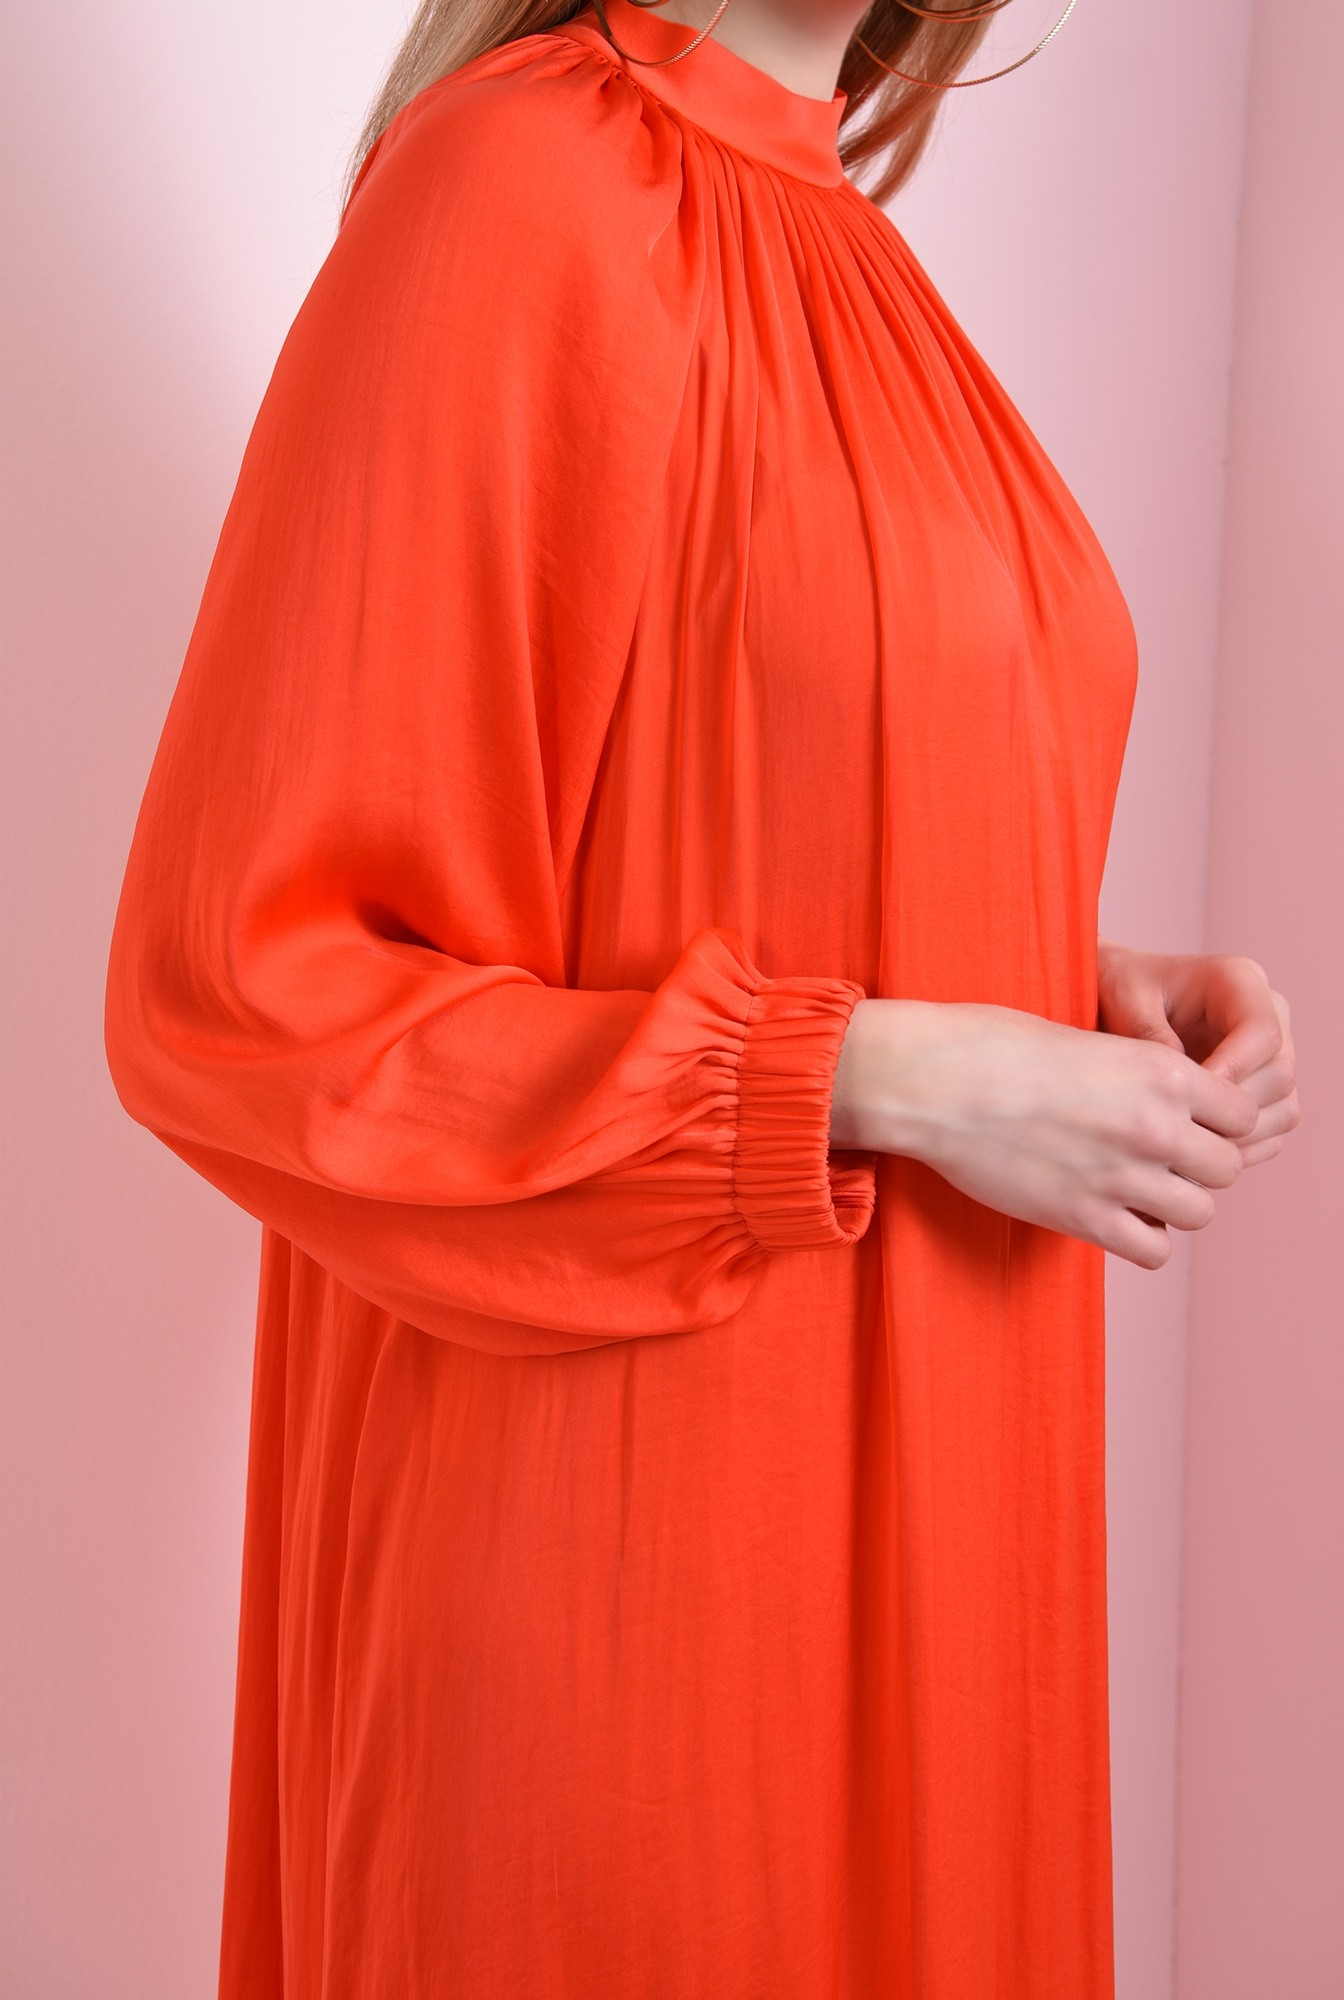 2 - rochie din satin, cu maneca voluminoasa